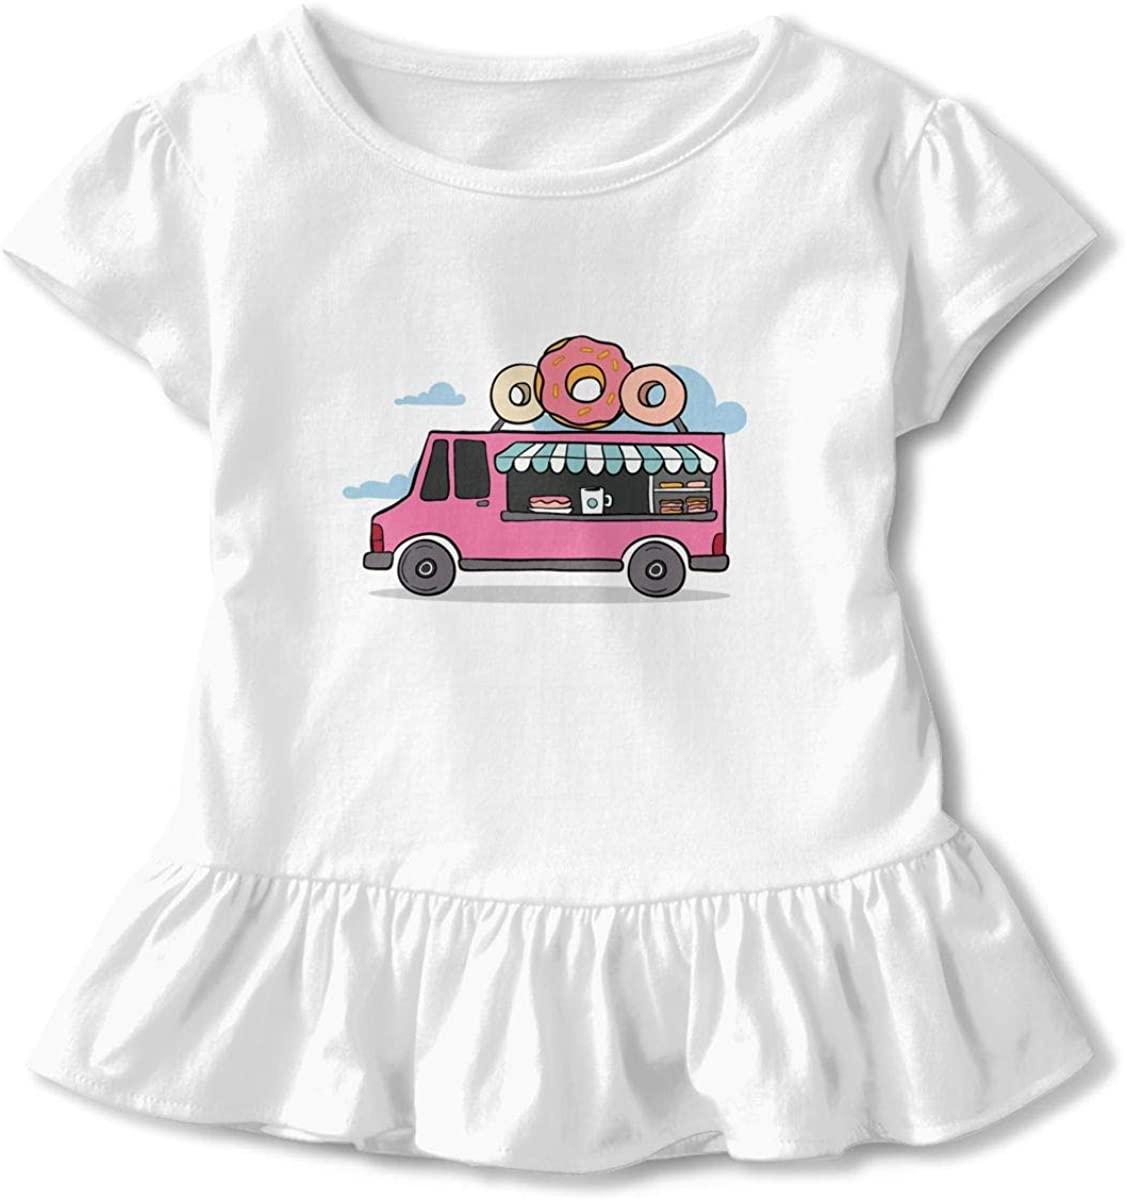 WQTYIUIO Doughnut Car Girls Short-Sleeve Cartoon T-Shirts with Flounce Details